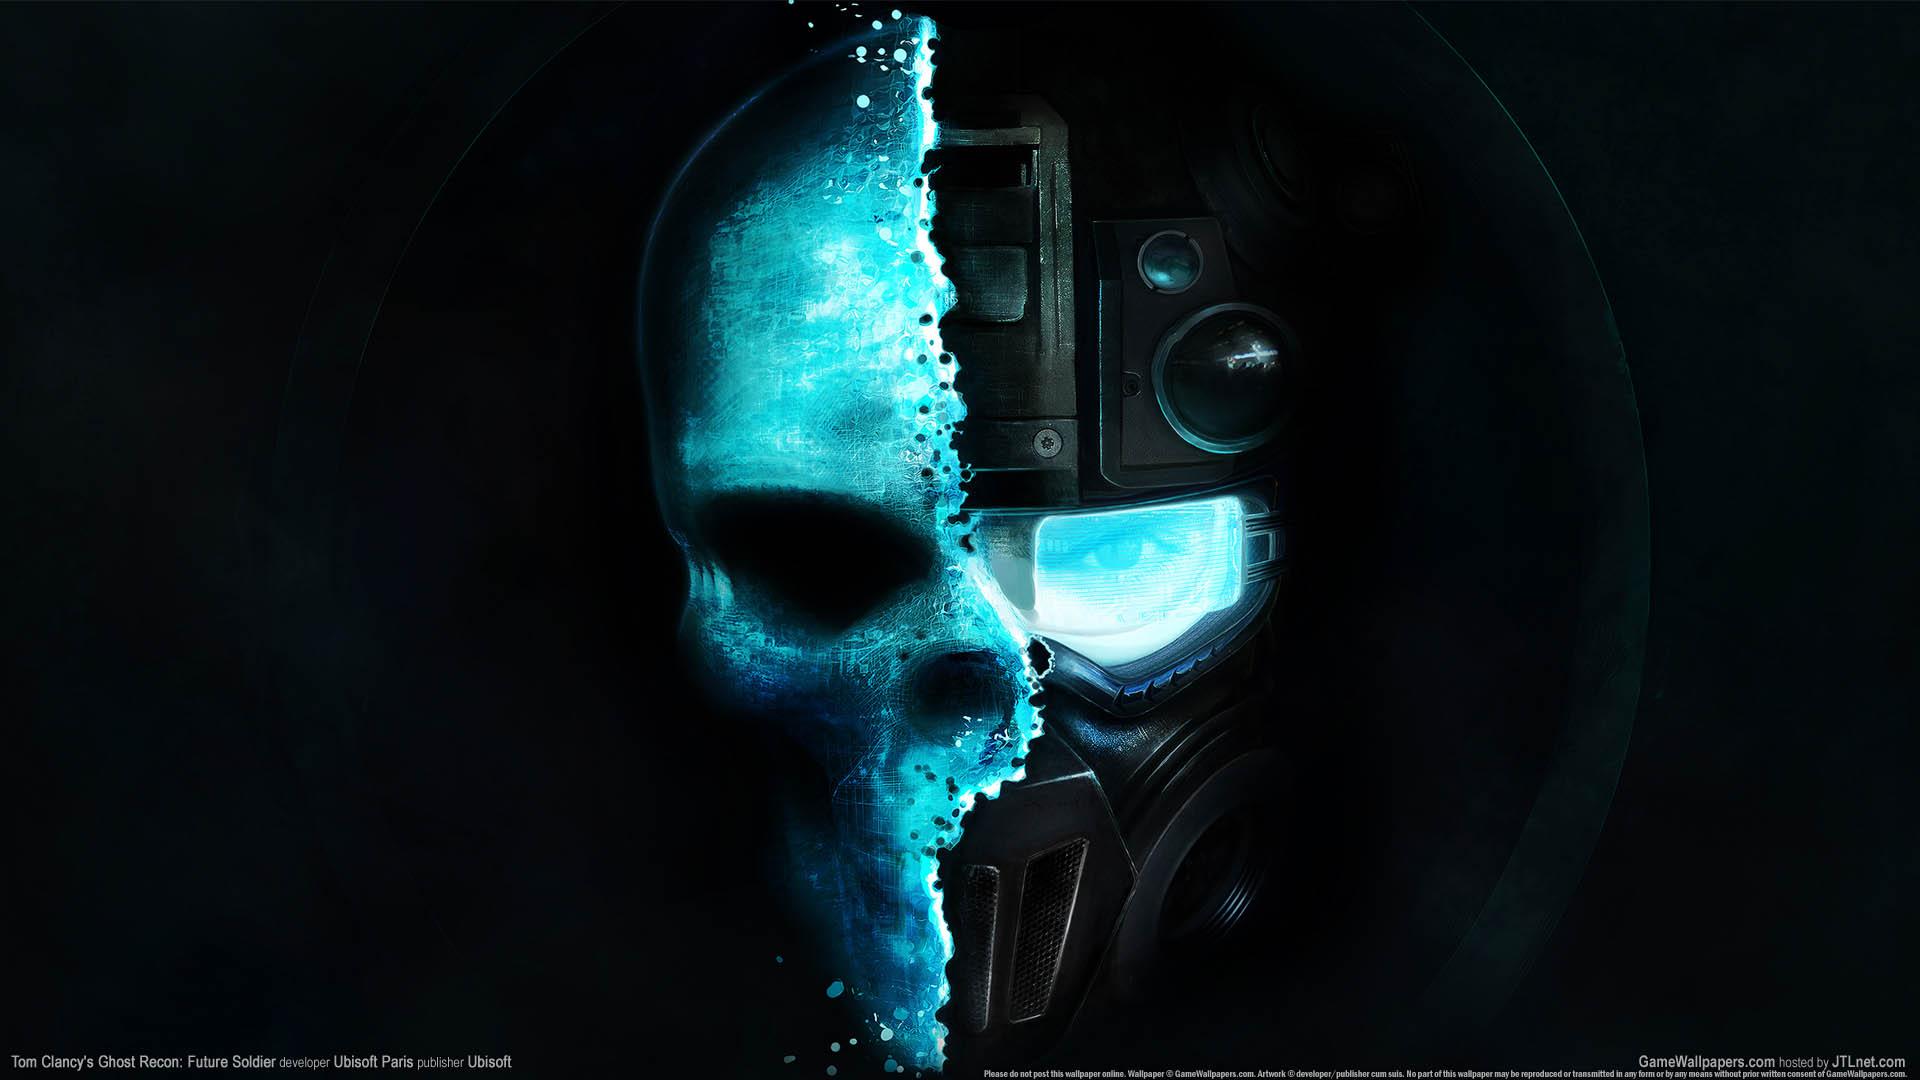 Tom Clancy's Ghost Recon: Future Soldier Hintergrundbild 01 1920x1080